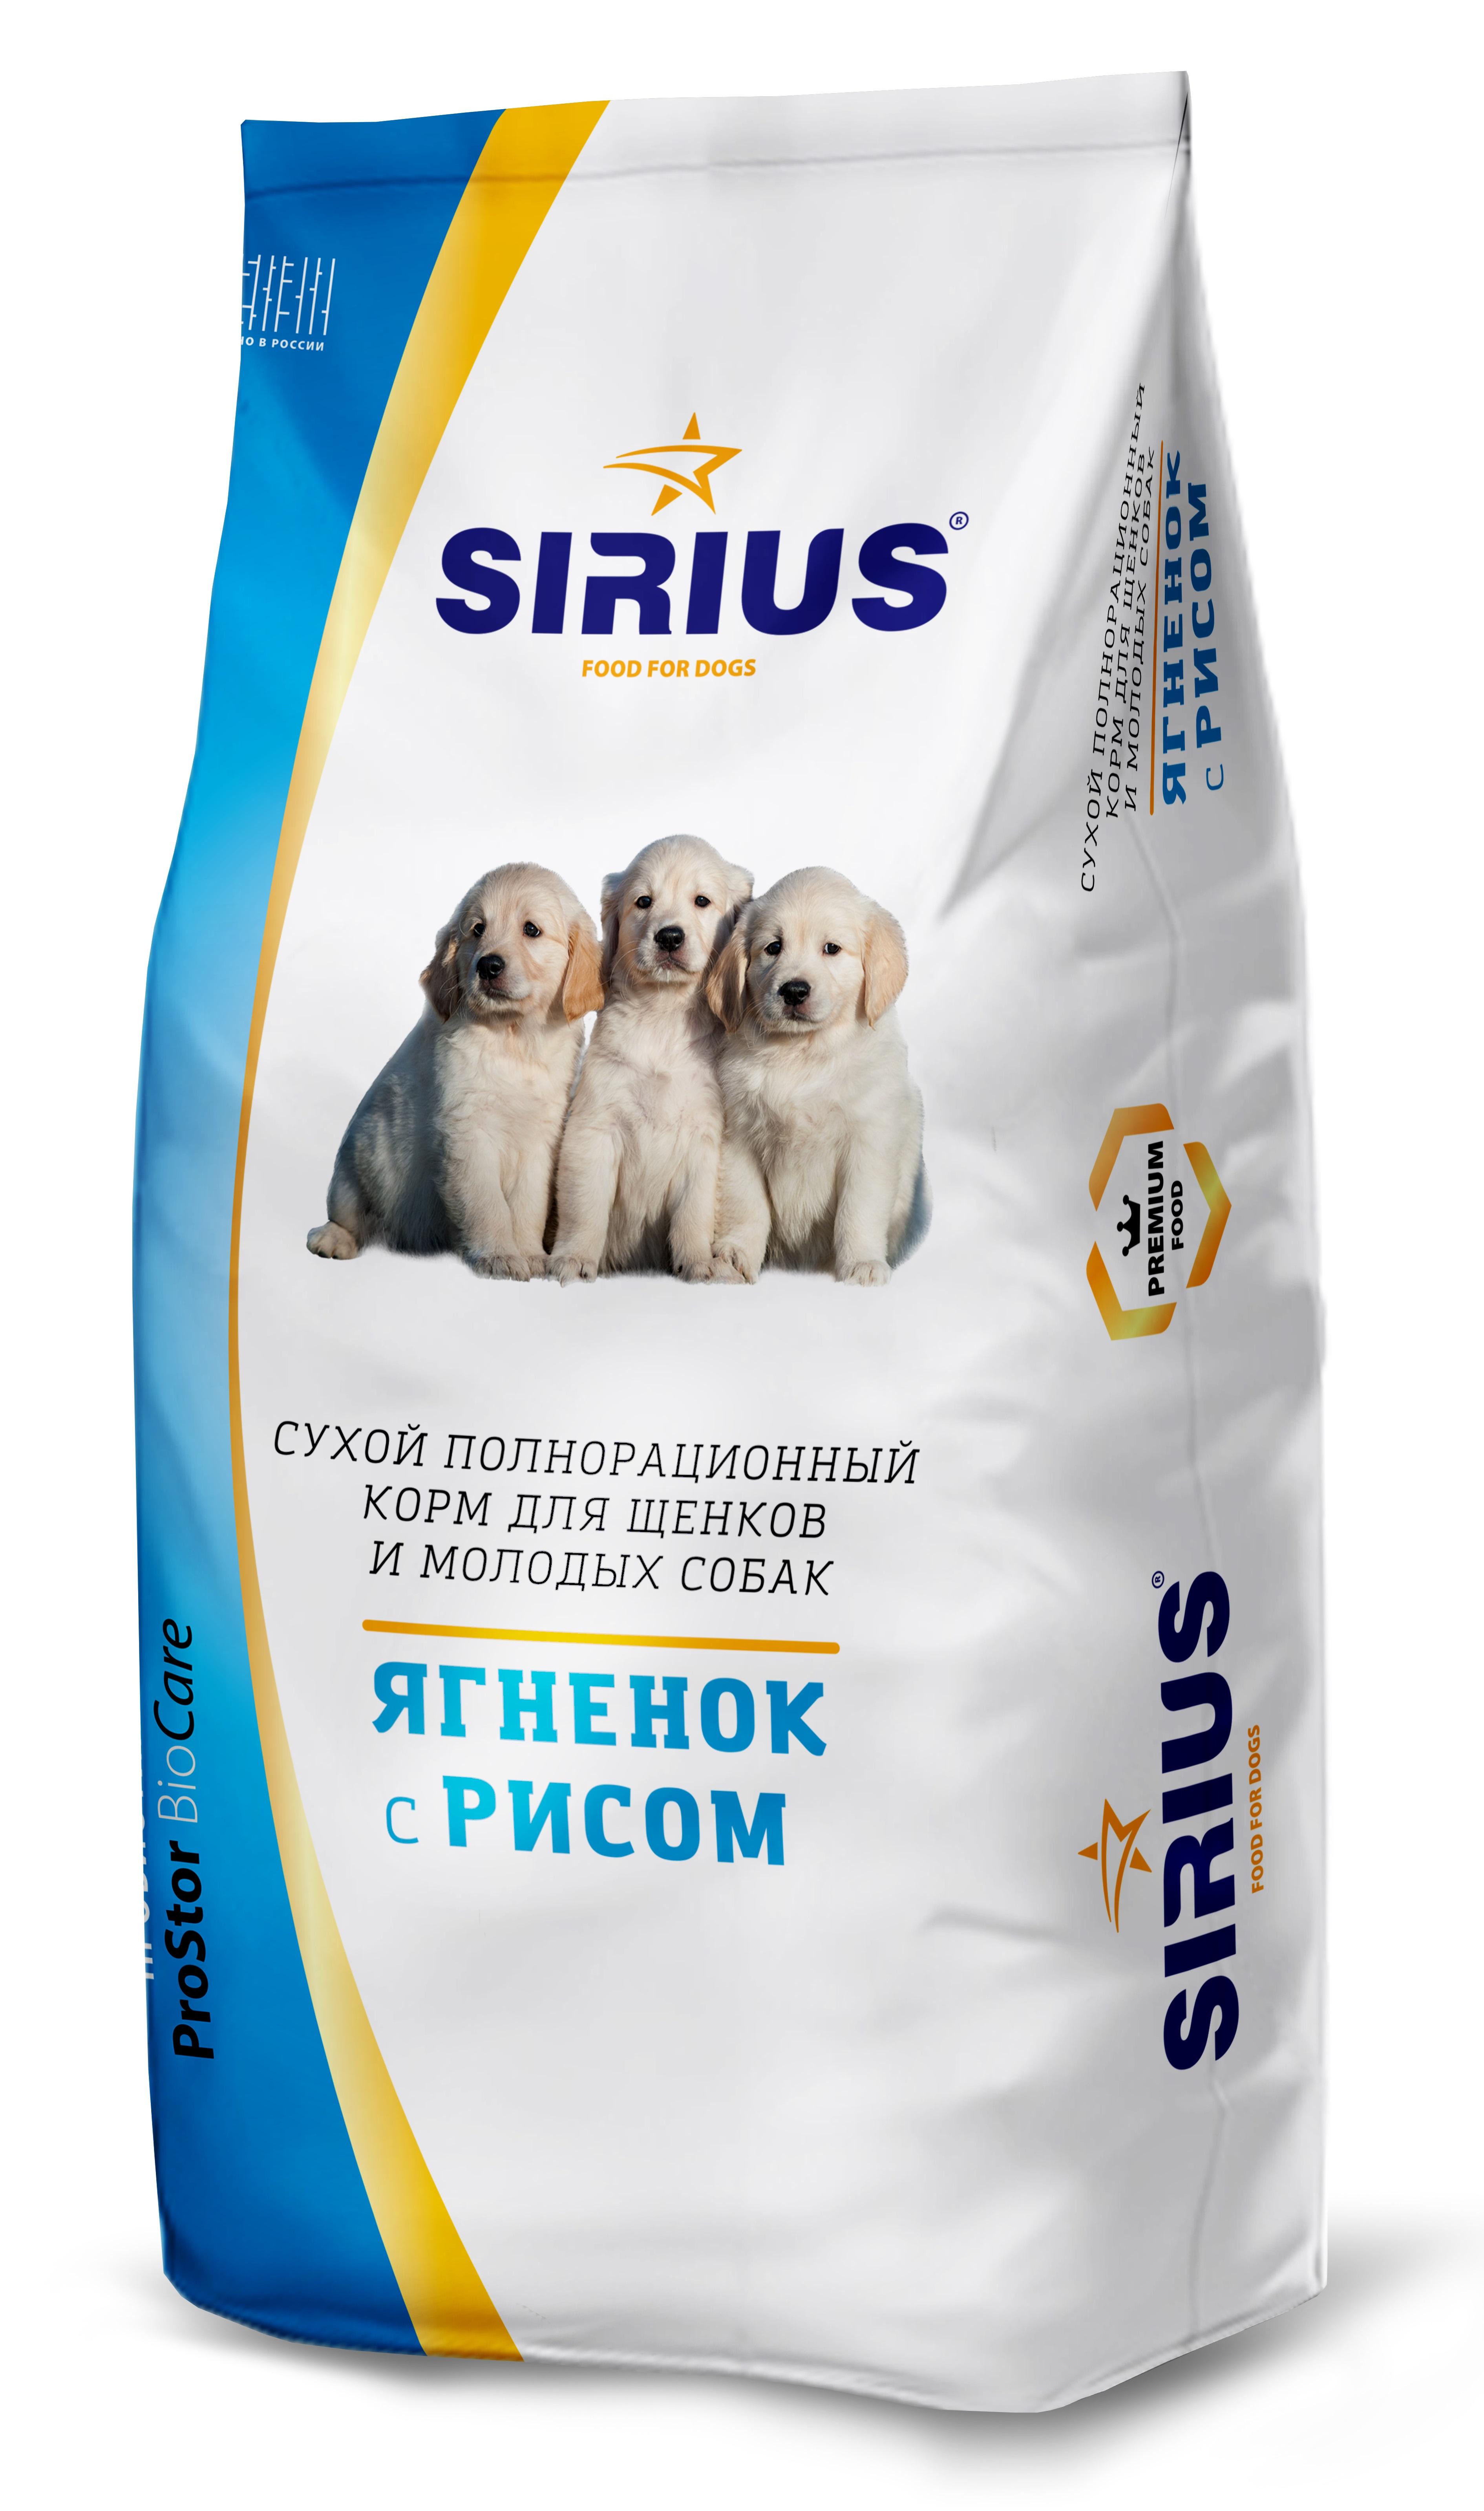 Сухой корм для щенков SIRIUS со вкусом ягненка и риса, 3 кг